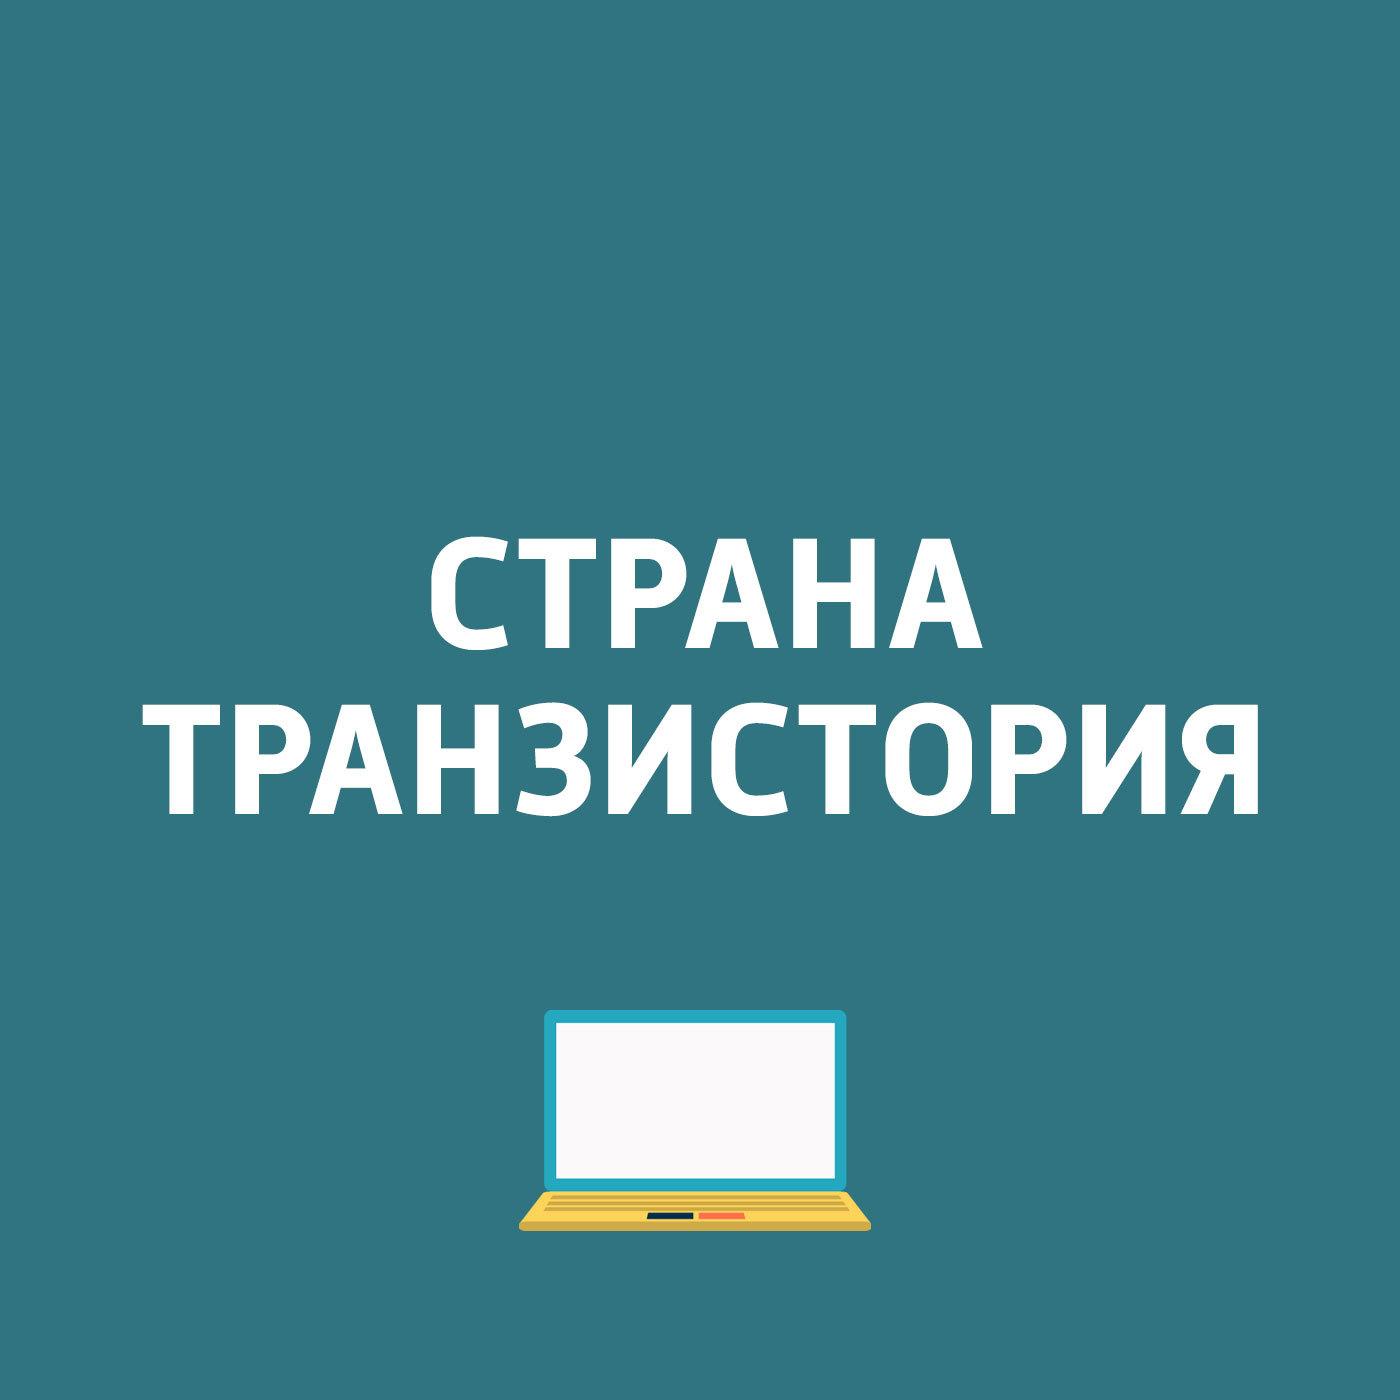 Картаев Павел Sony XZ Premium начали продавать в России oneplus 3t a3010 5 5 inch 6gb 128gb smartphone black